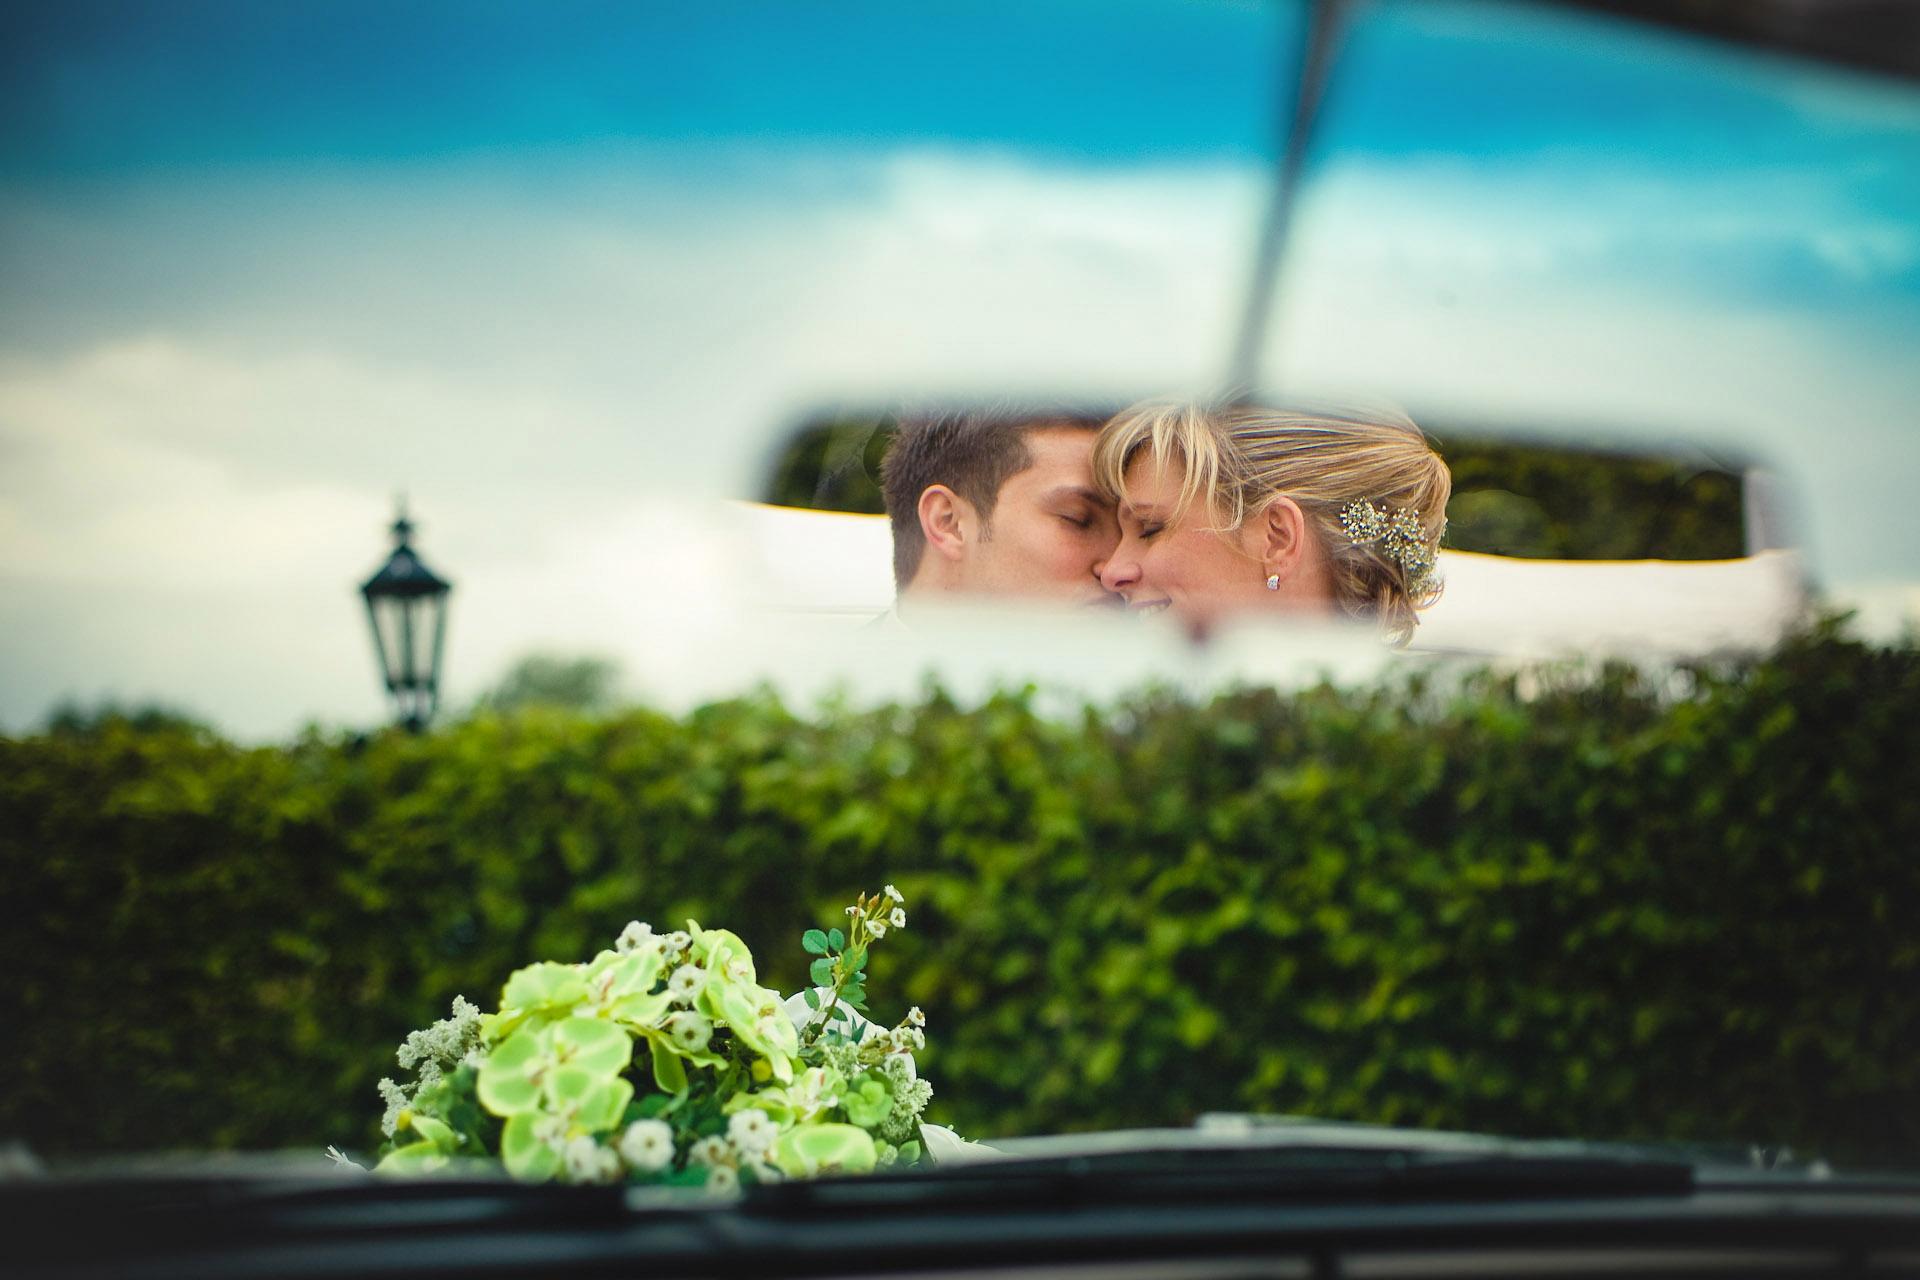 Kreative Hochzeitsfotos Brautpaar im Rückspiegel